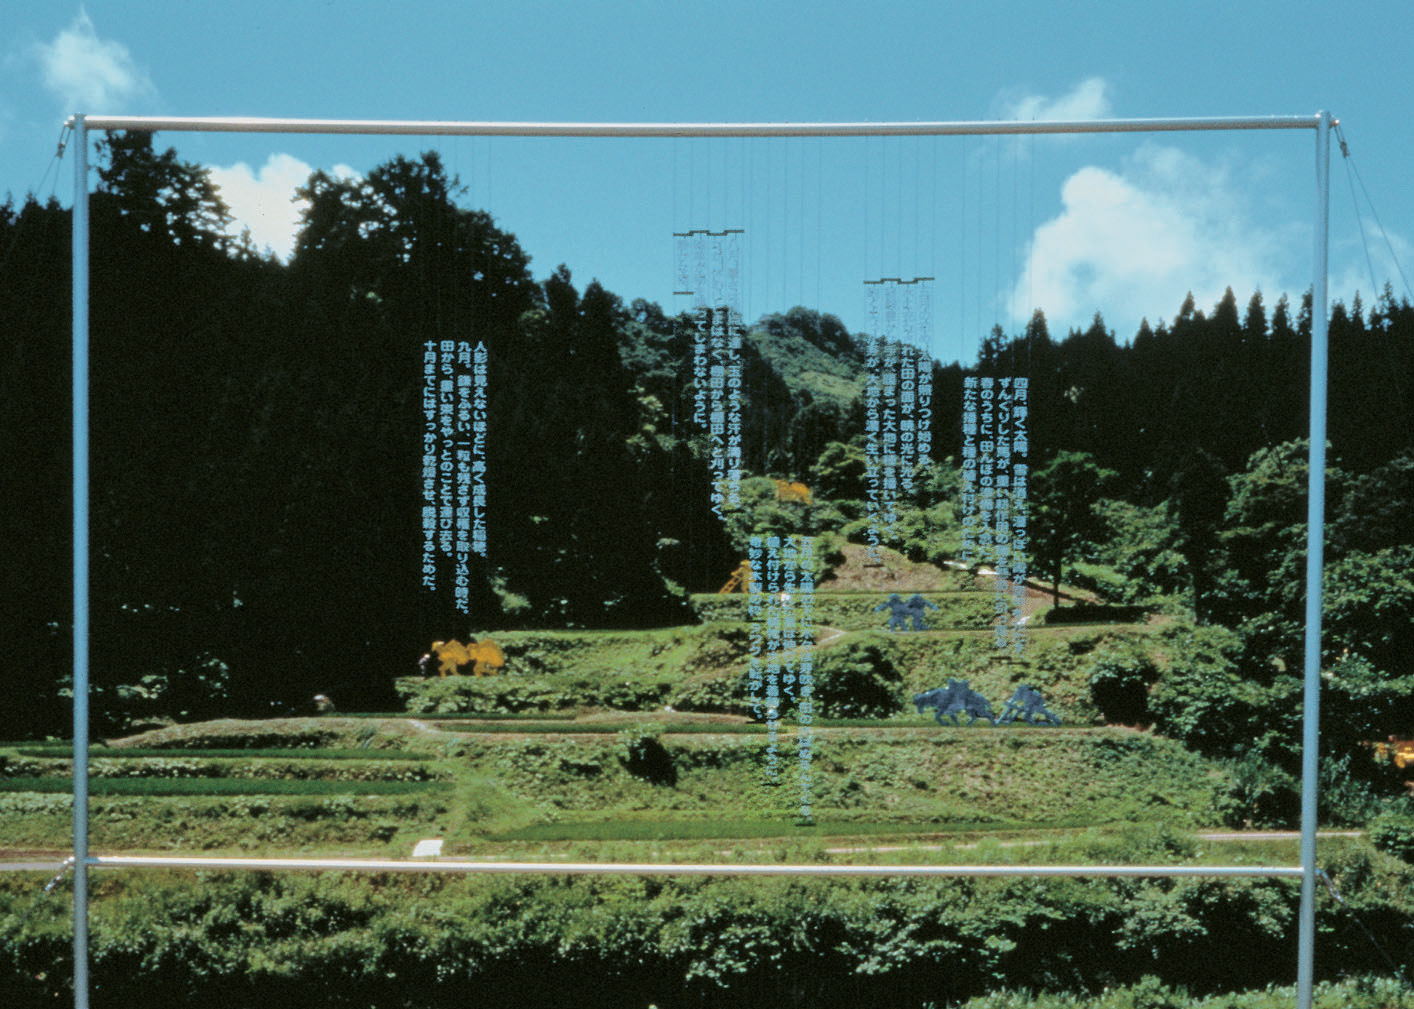 View-of-installation-Echigo-TsumariRegion-2000-Photo-by-S.-Anzai.jpg